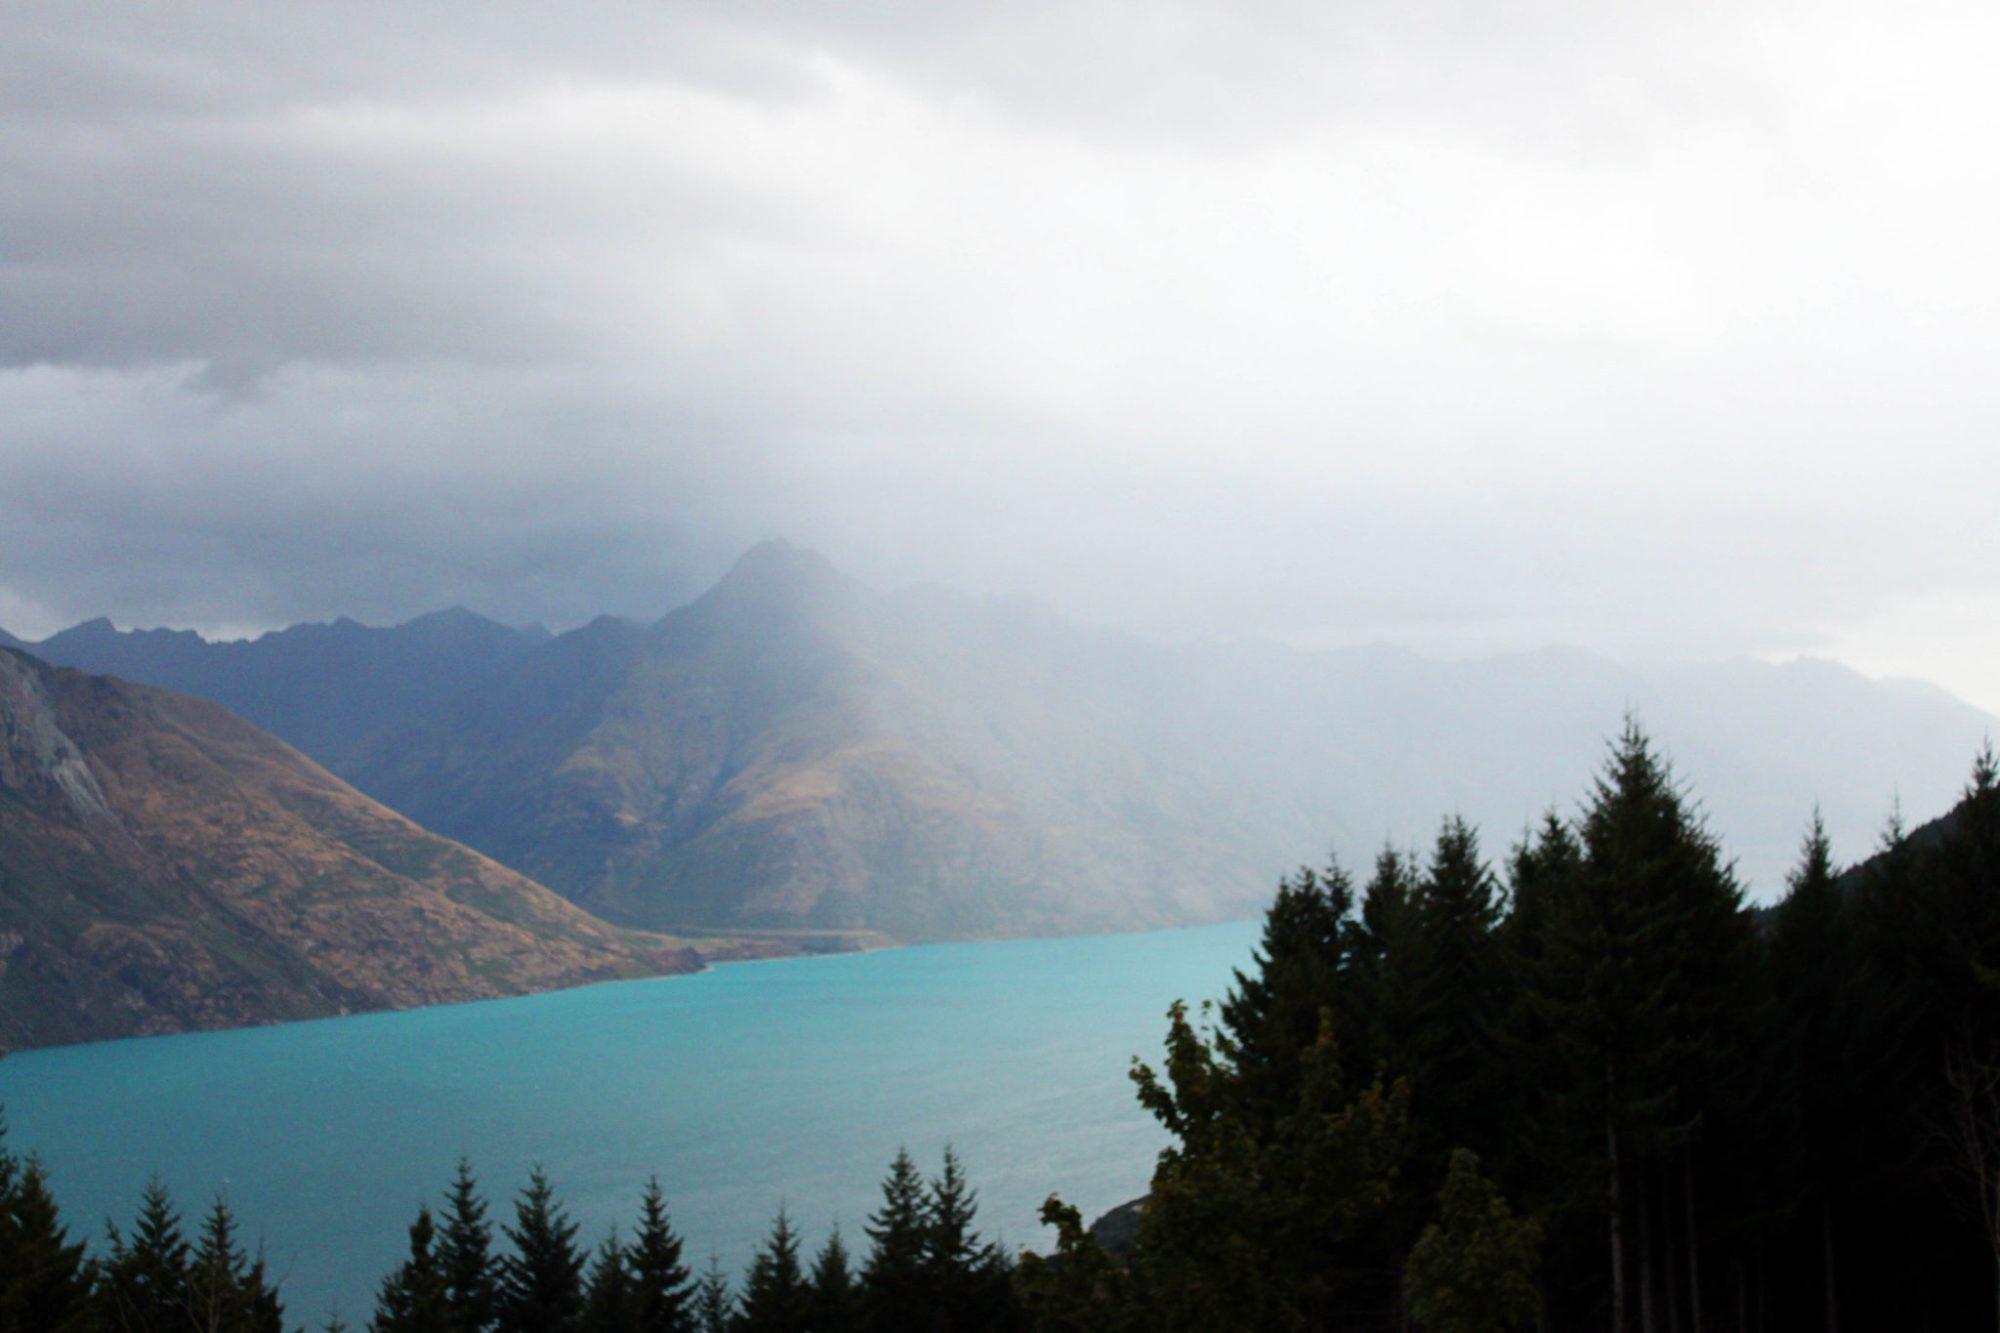 Best hikes in Queenstown New Zealand   8 Unforgettable things to do in Queenstown New Zealand #queenstown #newzealand #simplywander